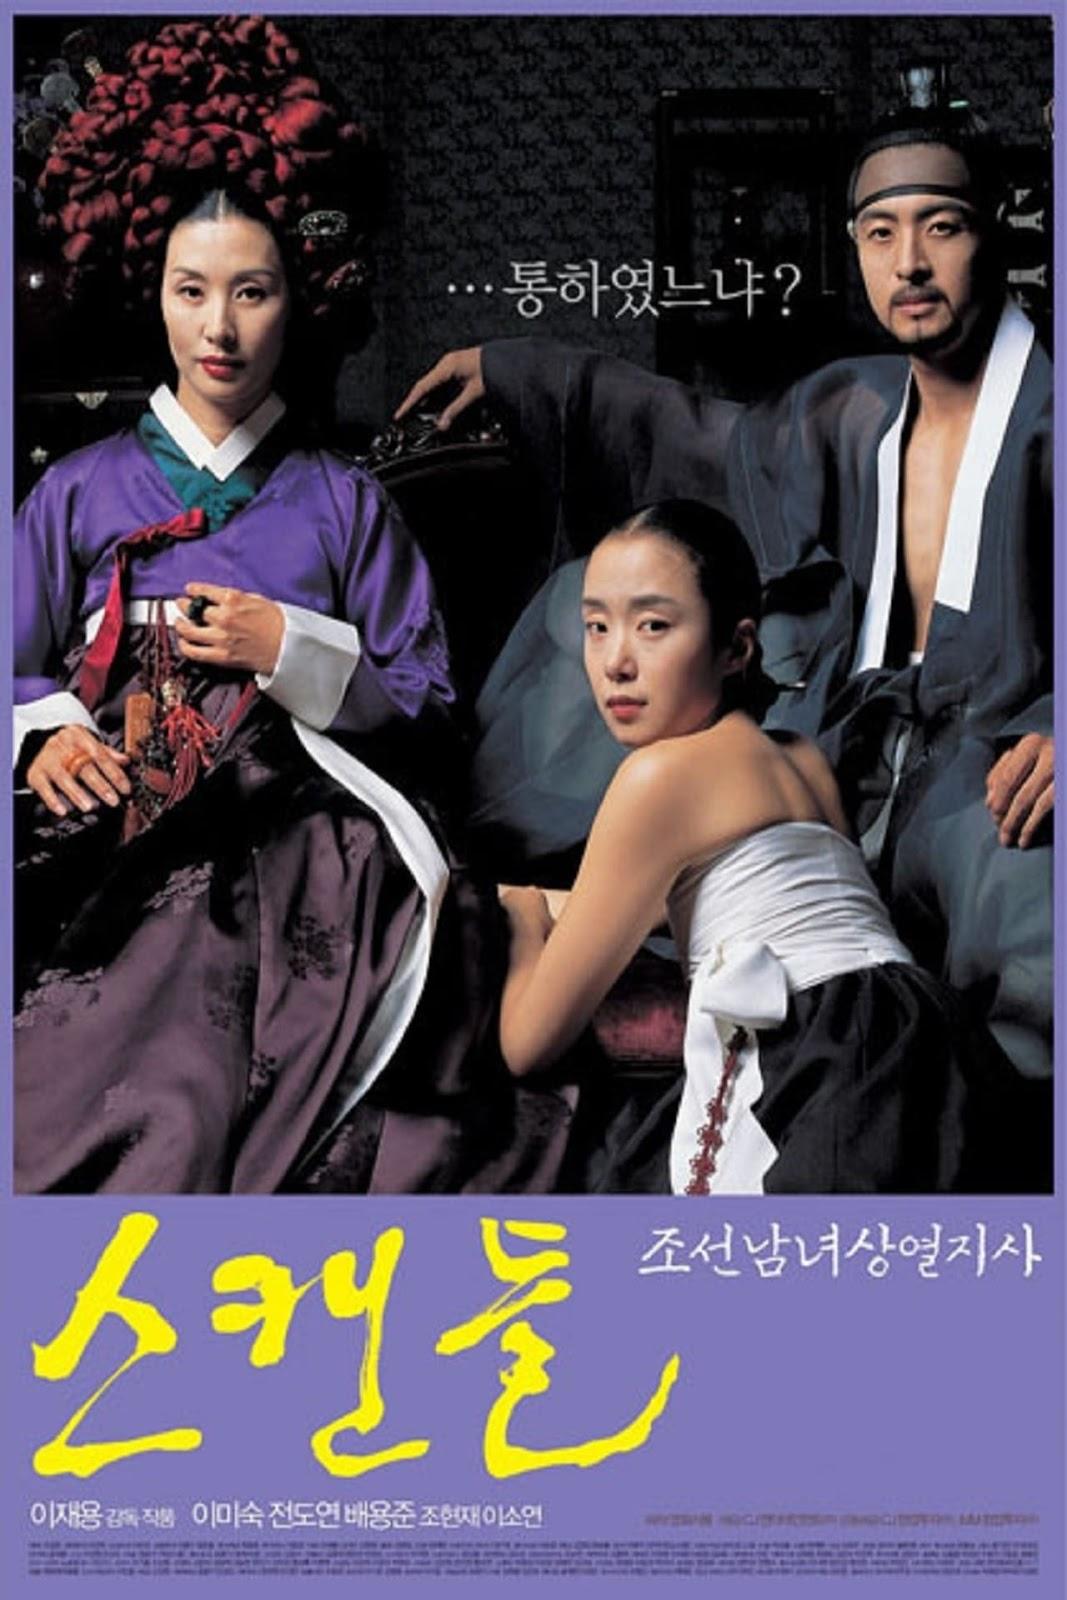 Untold Scandal Full Korea 18+ Adult Movie Online Free